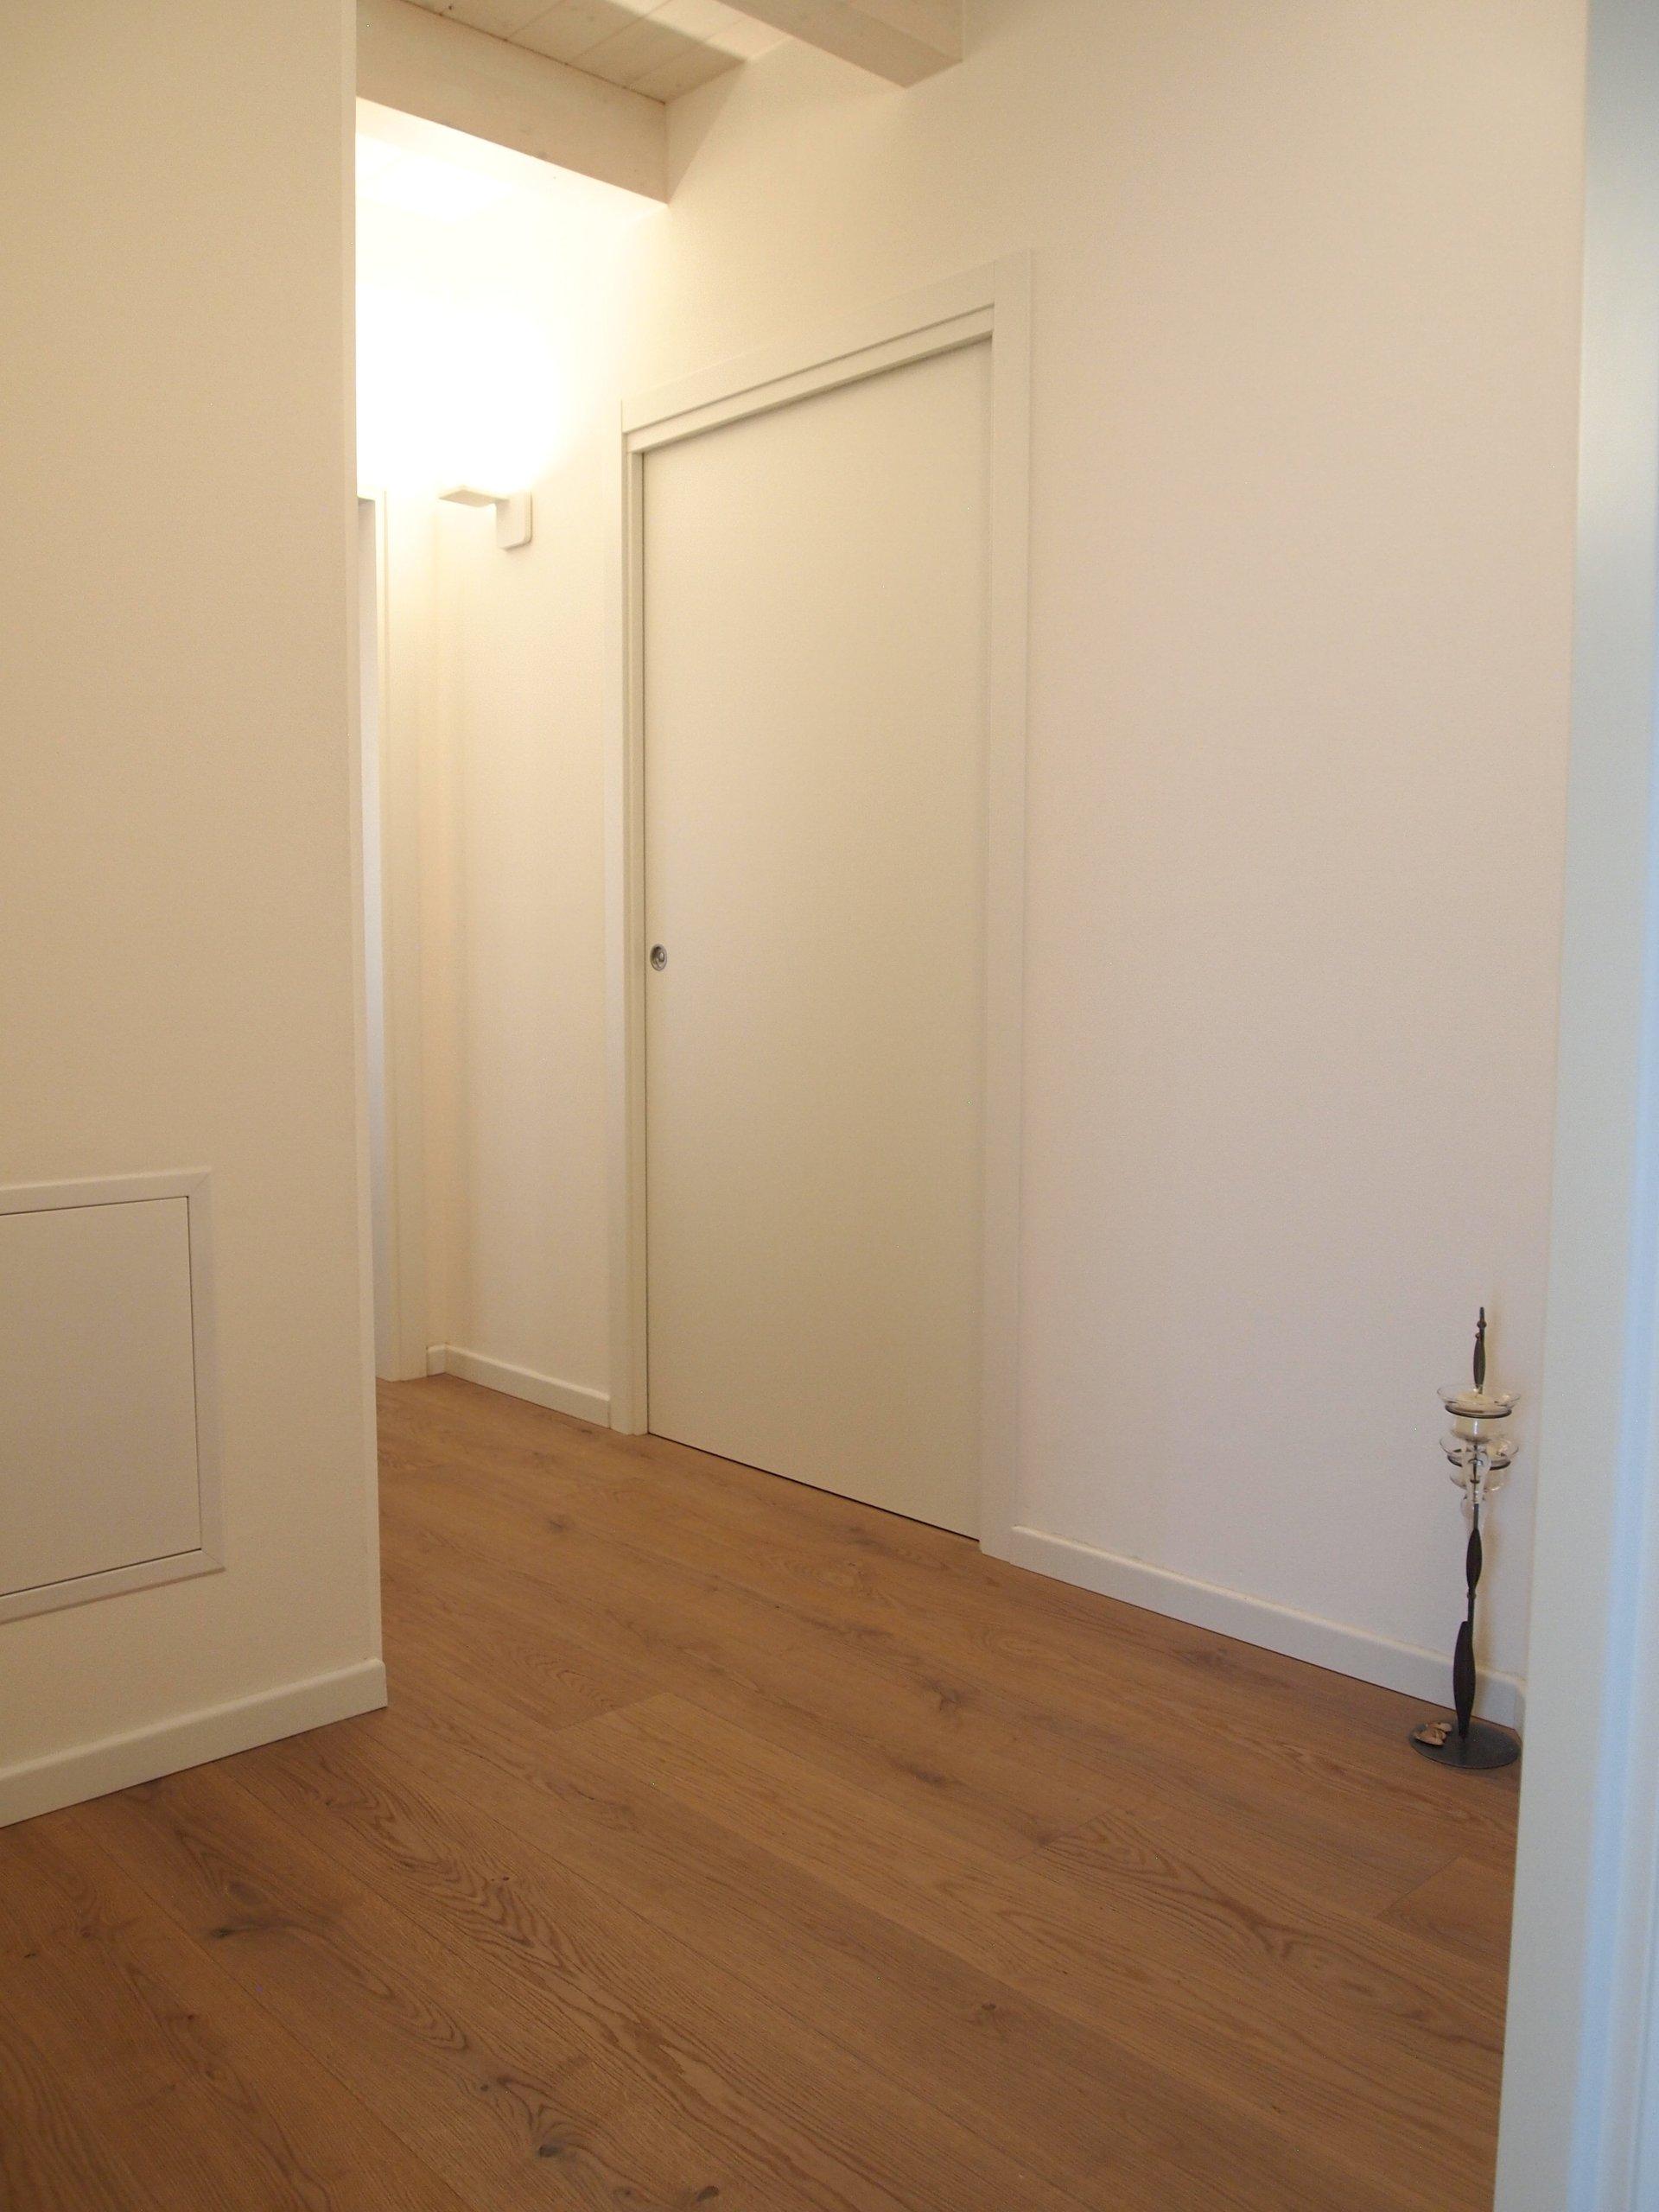 muri bianchi e parquet